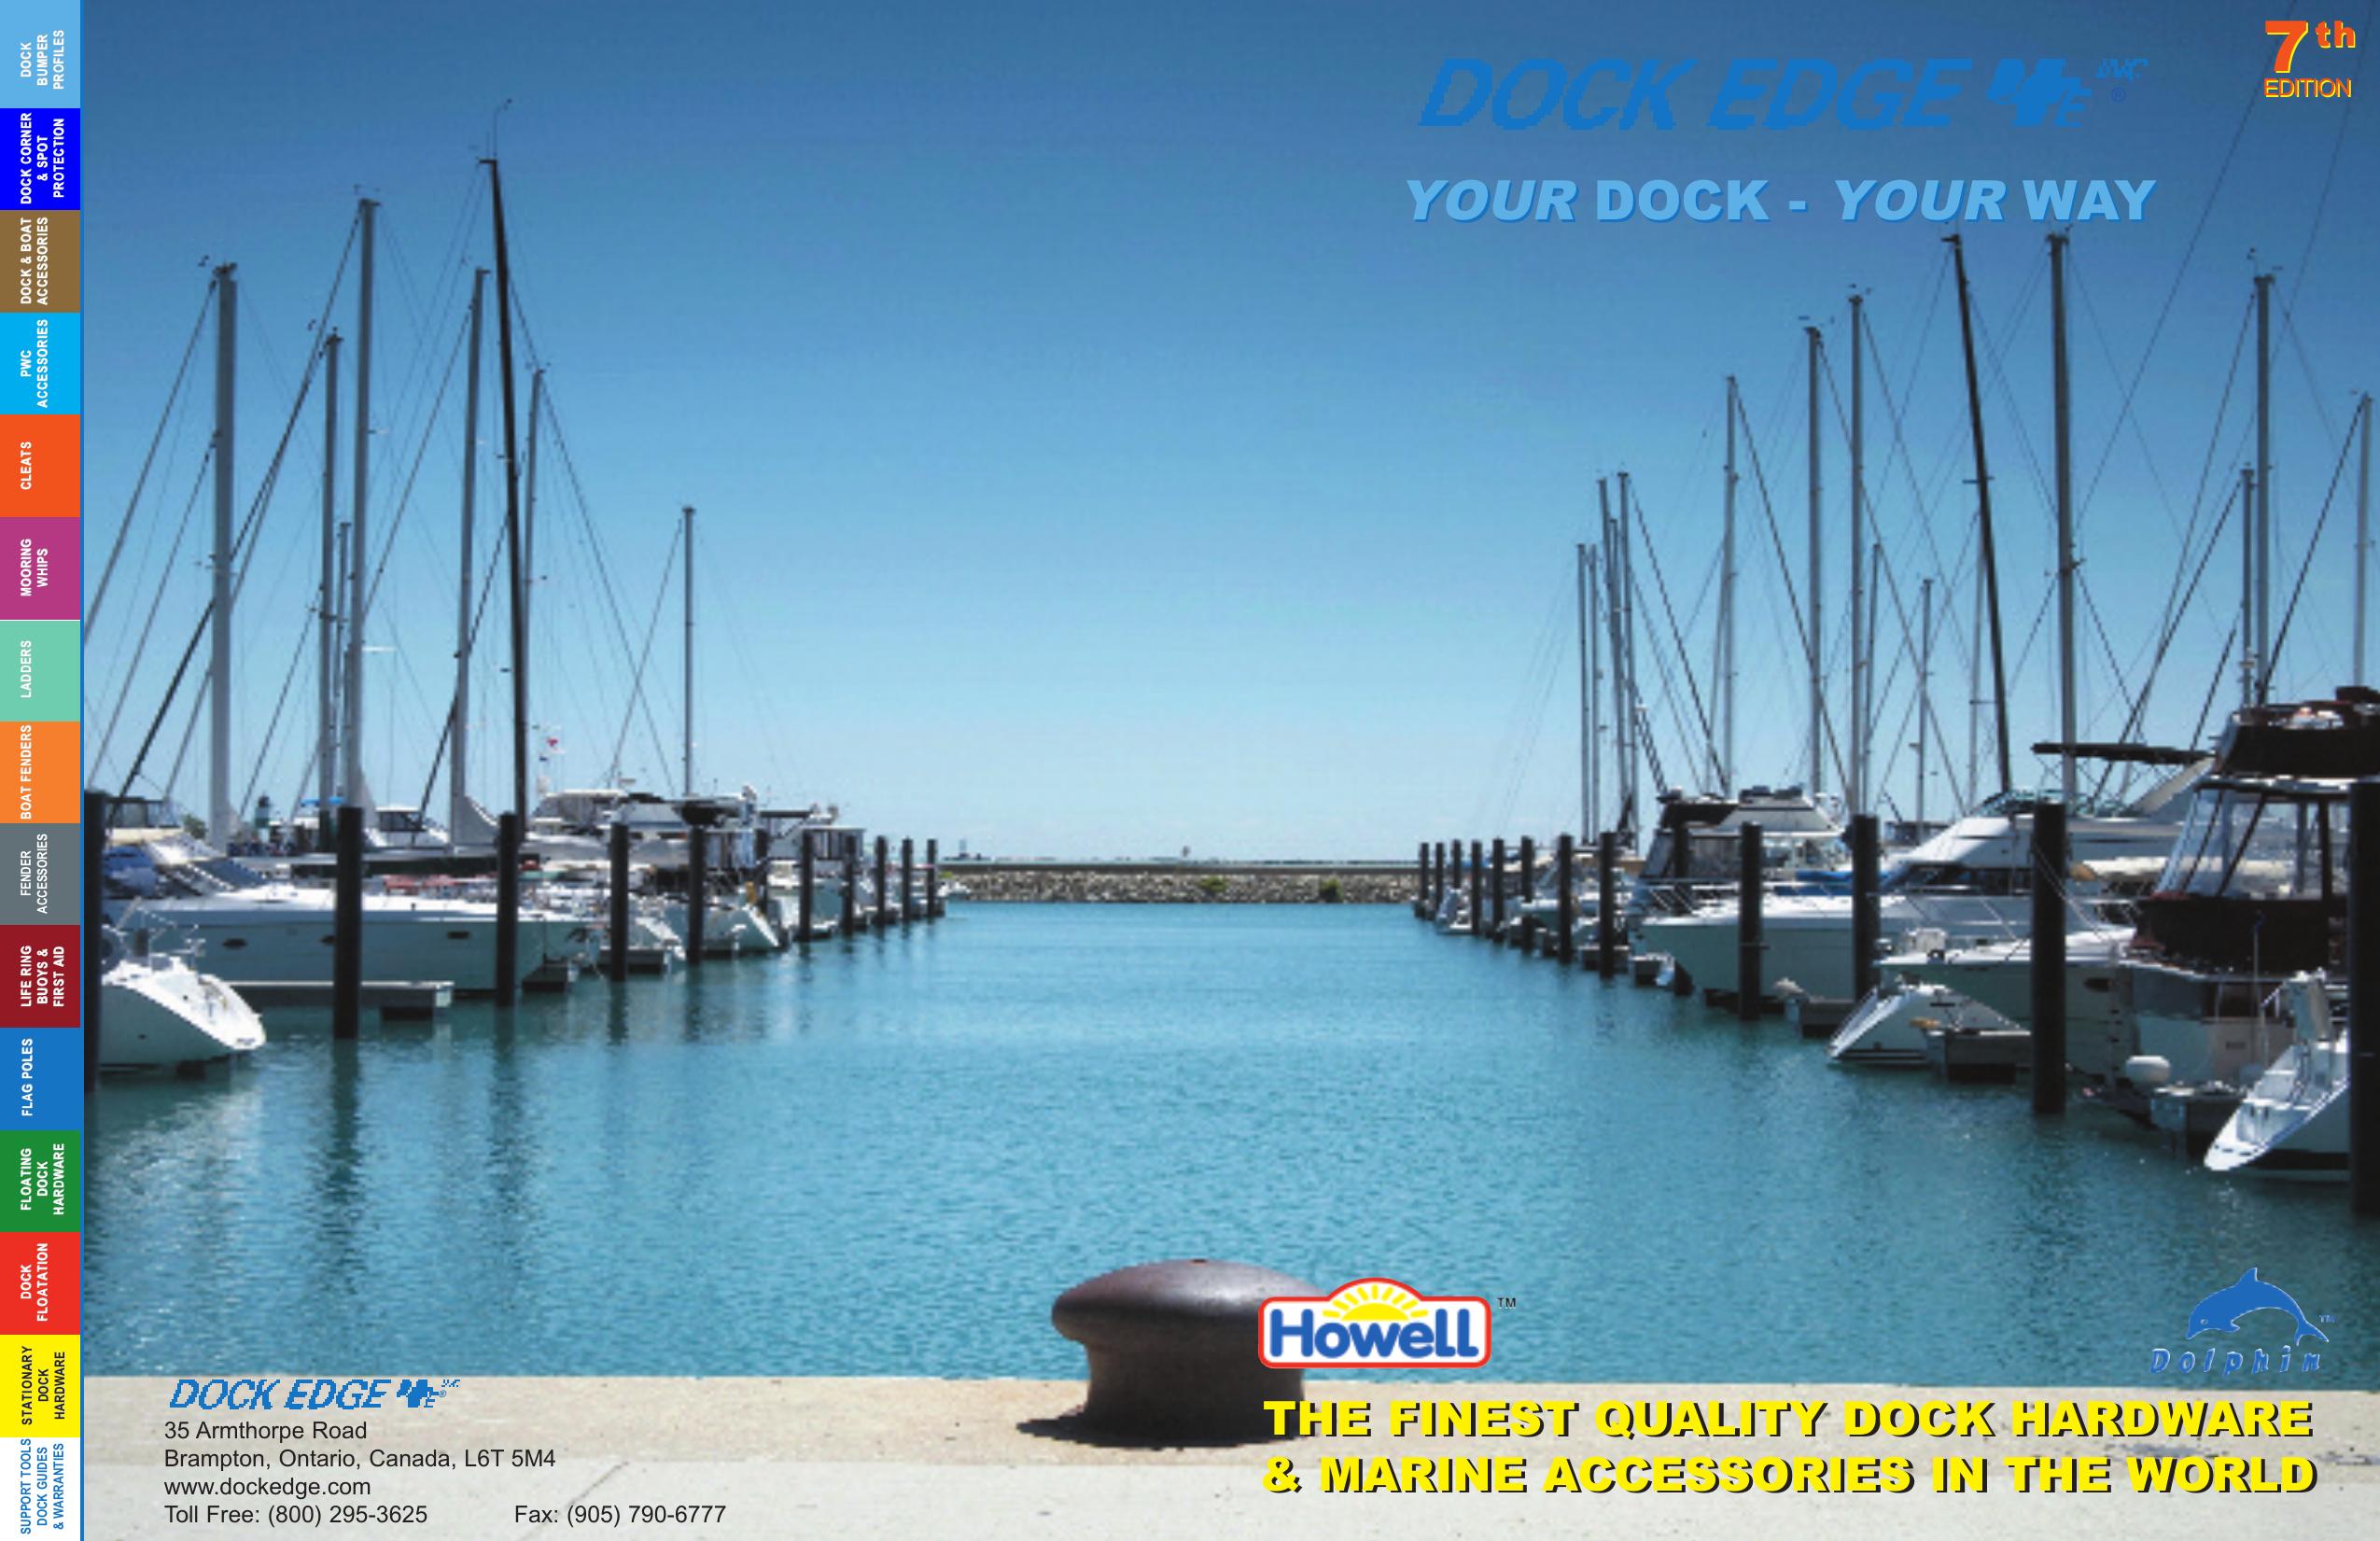 J Hook SS Flush Mount LifeRing Buoys Dock Edge